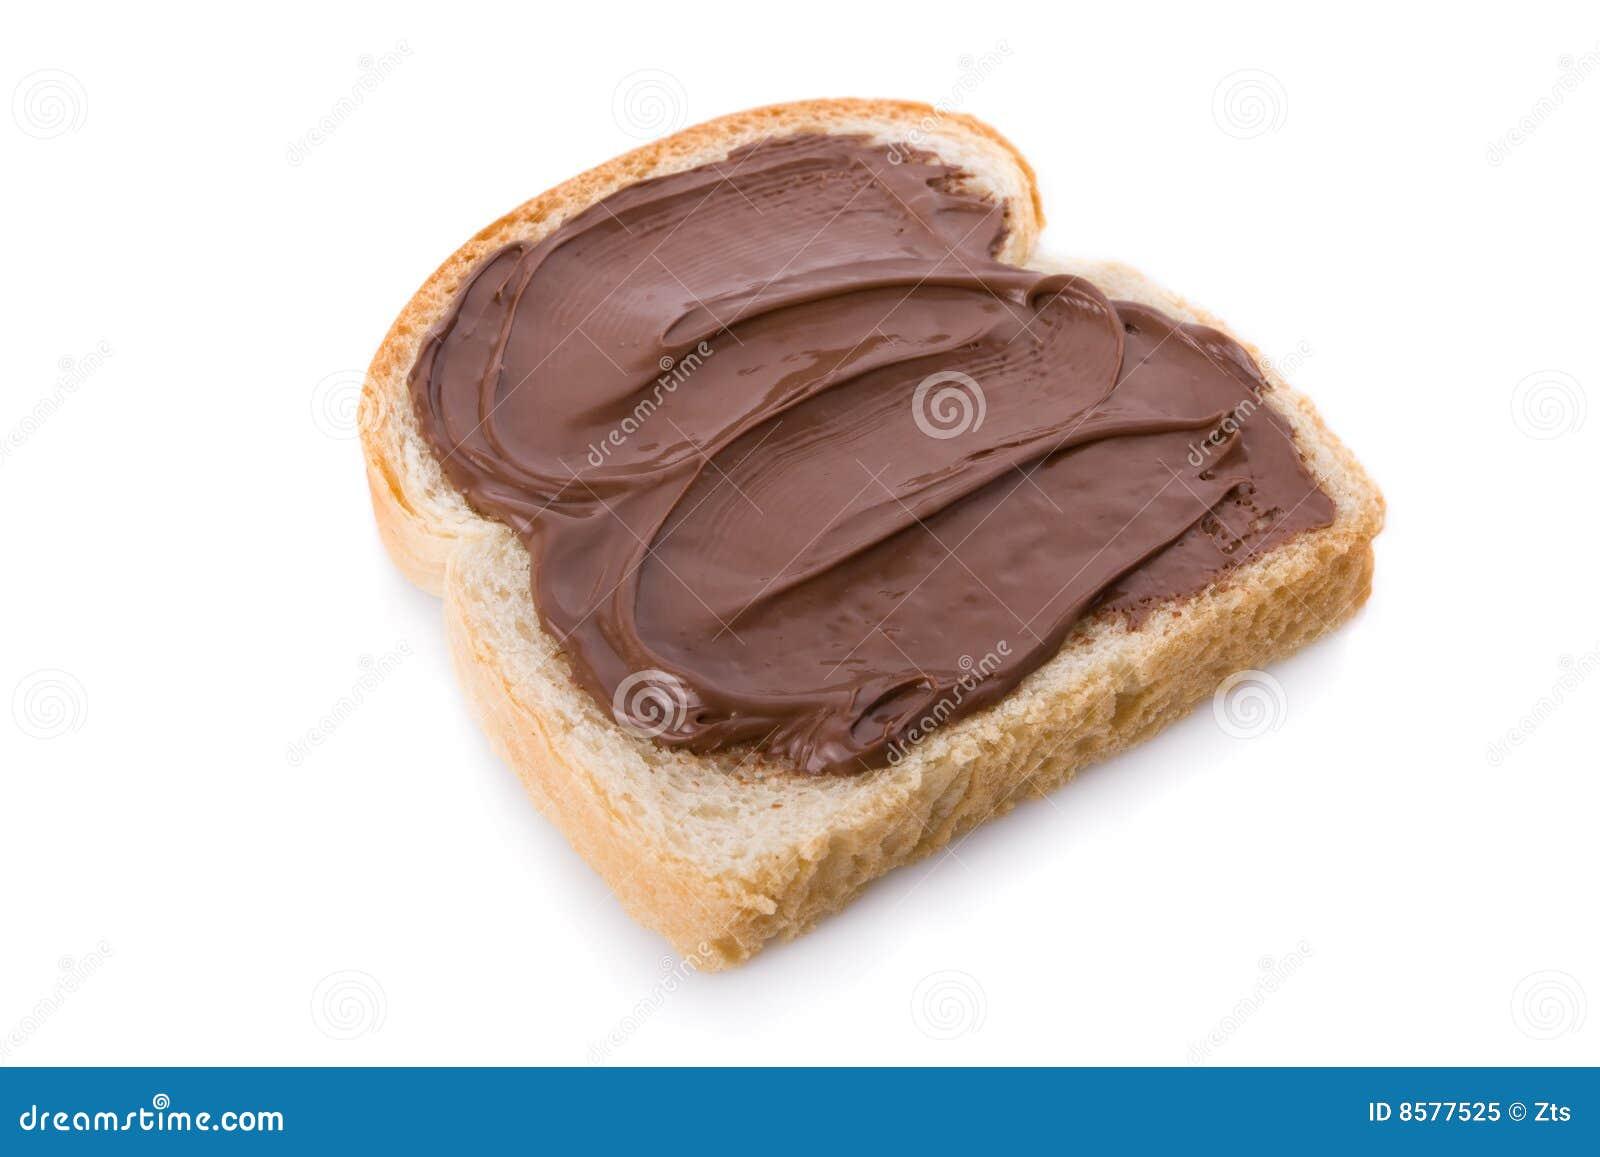 распространение фундука шоколада